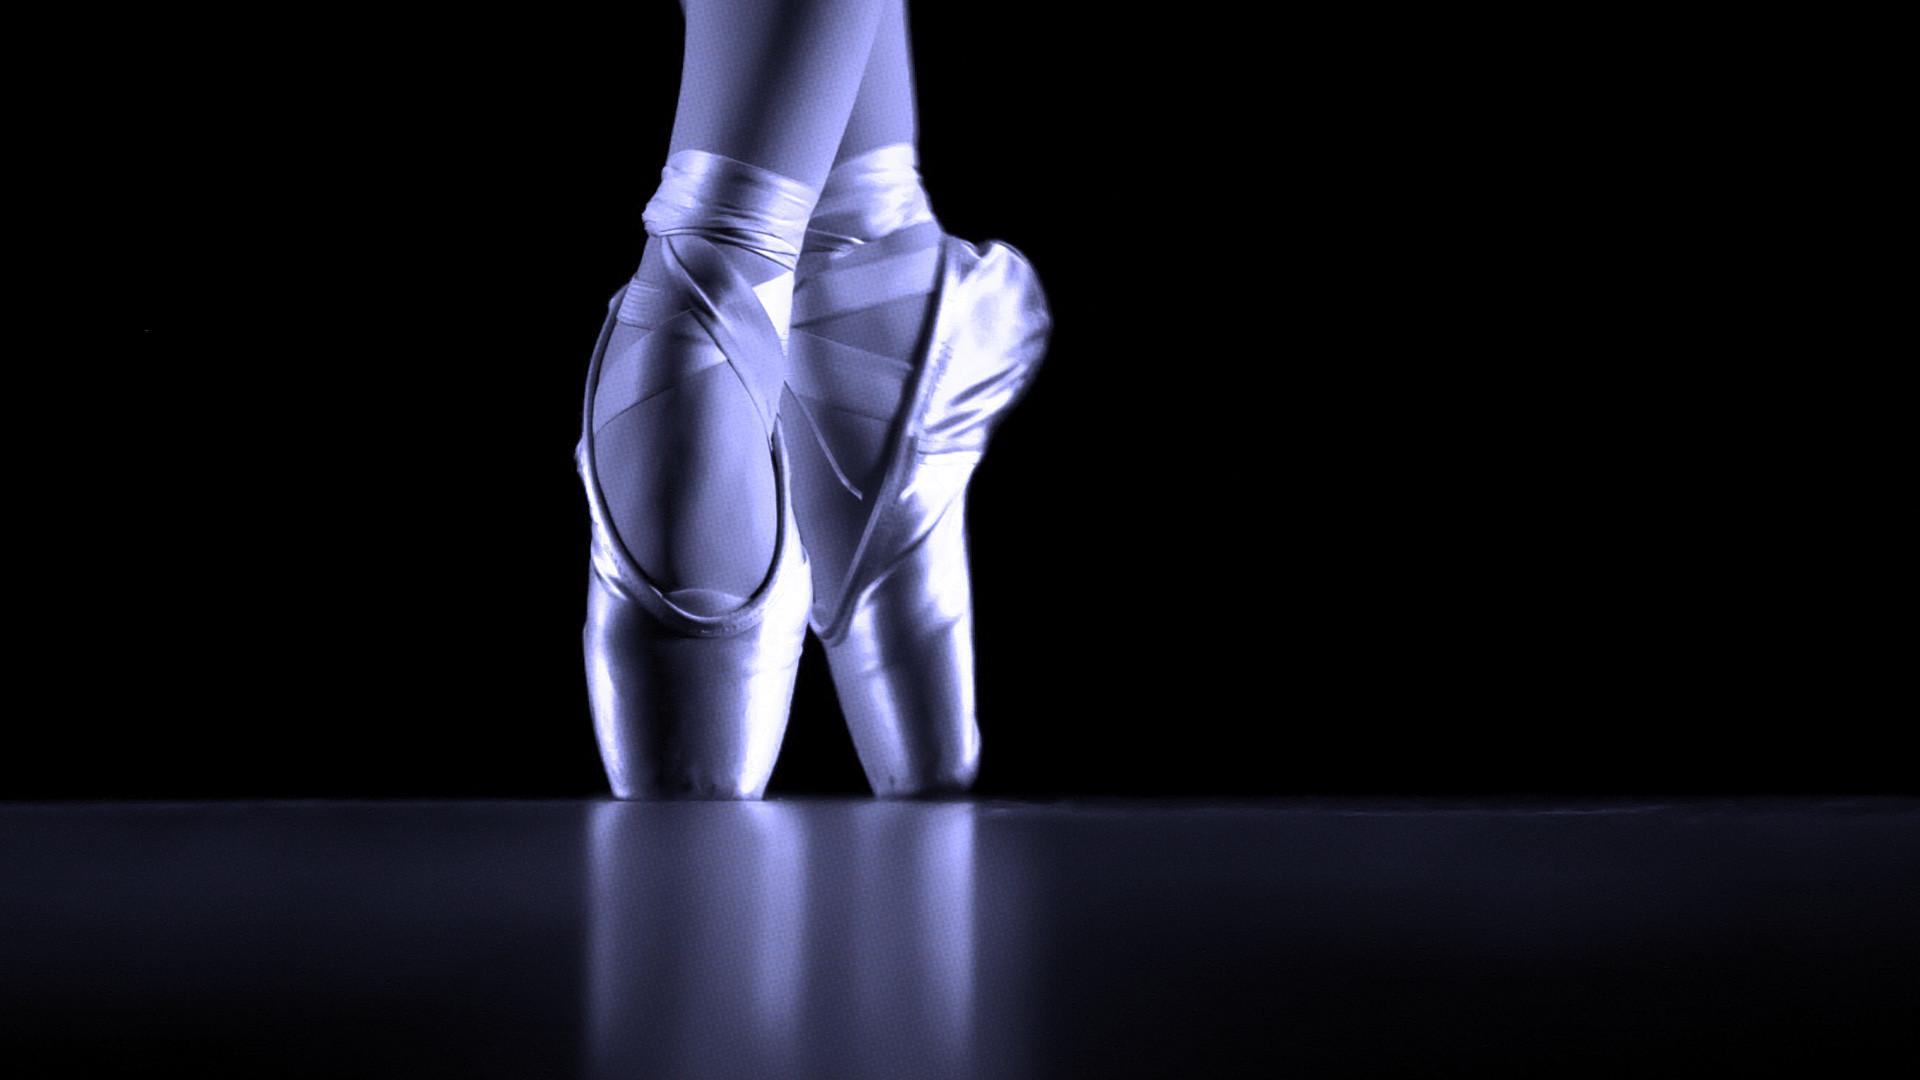 1920x1200 0 Ballet Wallpaper HD Hd